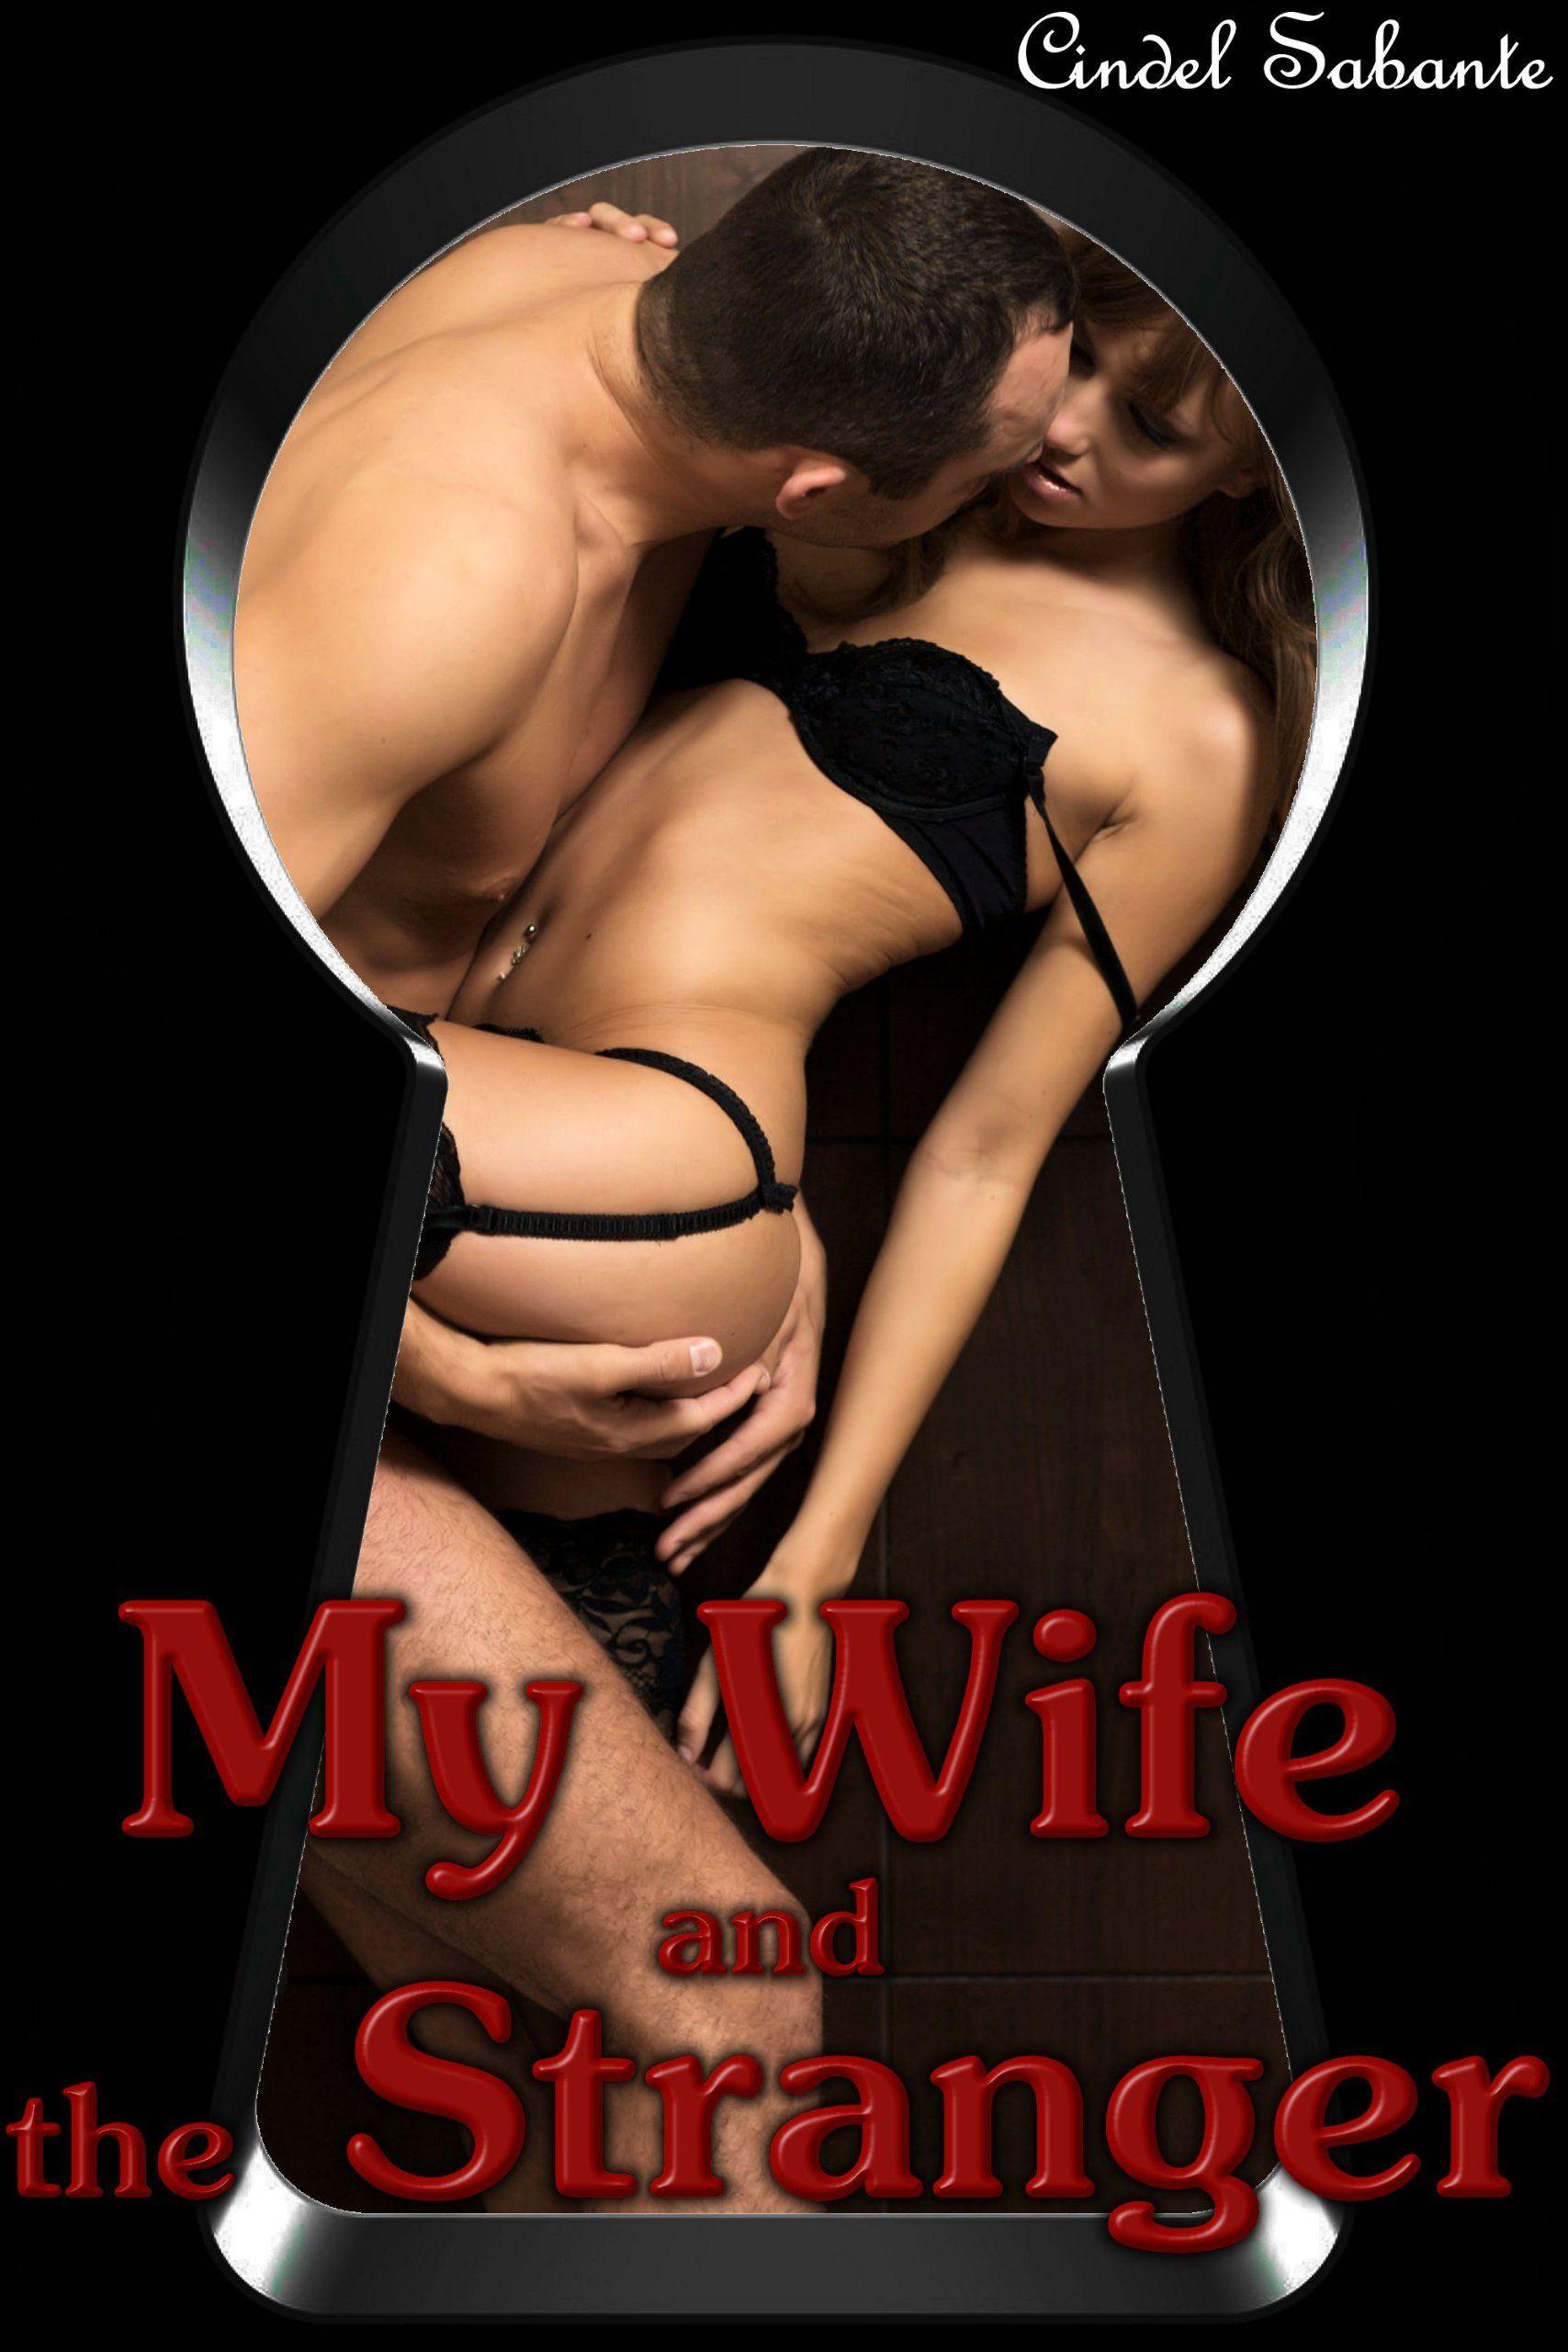 Femdom husband fiction